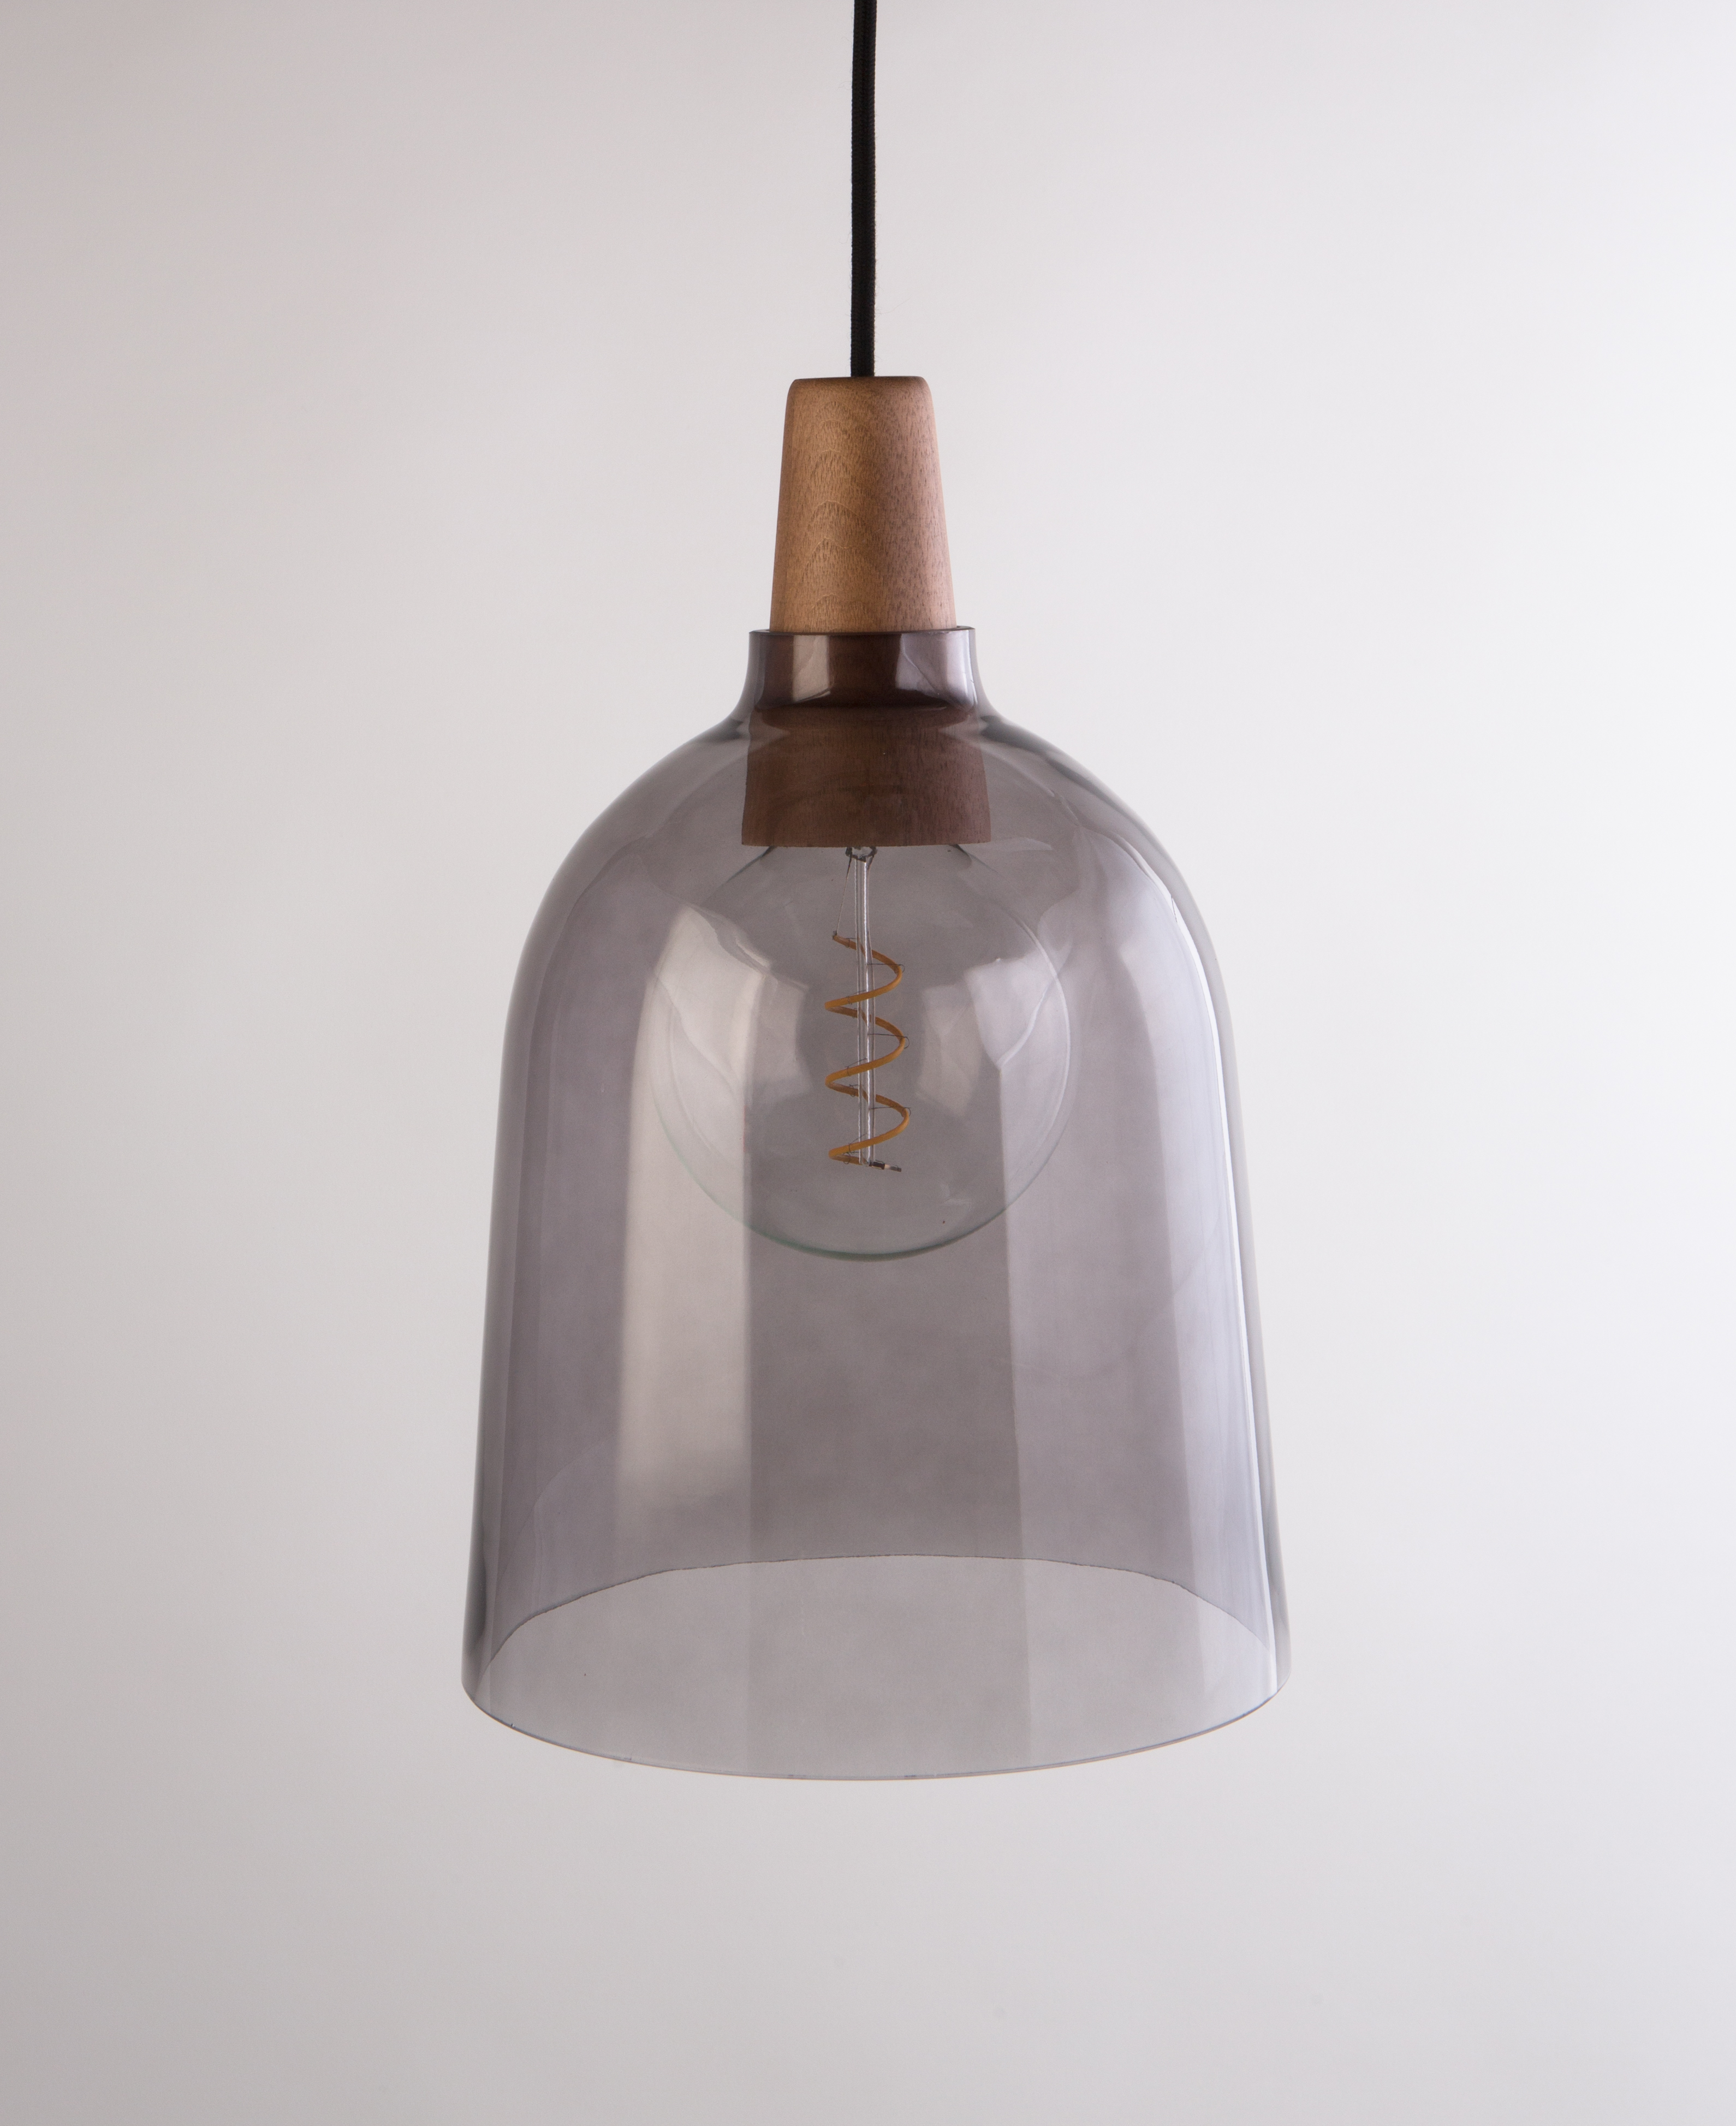 Karma Pendant Light Scandi style Ceiling Light in Glass  : bulkhead light 8 of 15 from www.dowsingandreynolds.com size 3180 x 3894 jpeg 3980kB